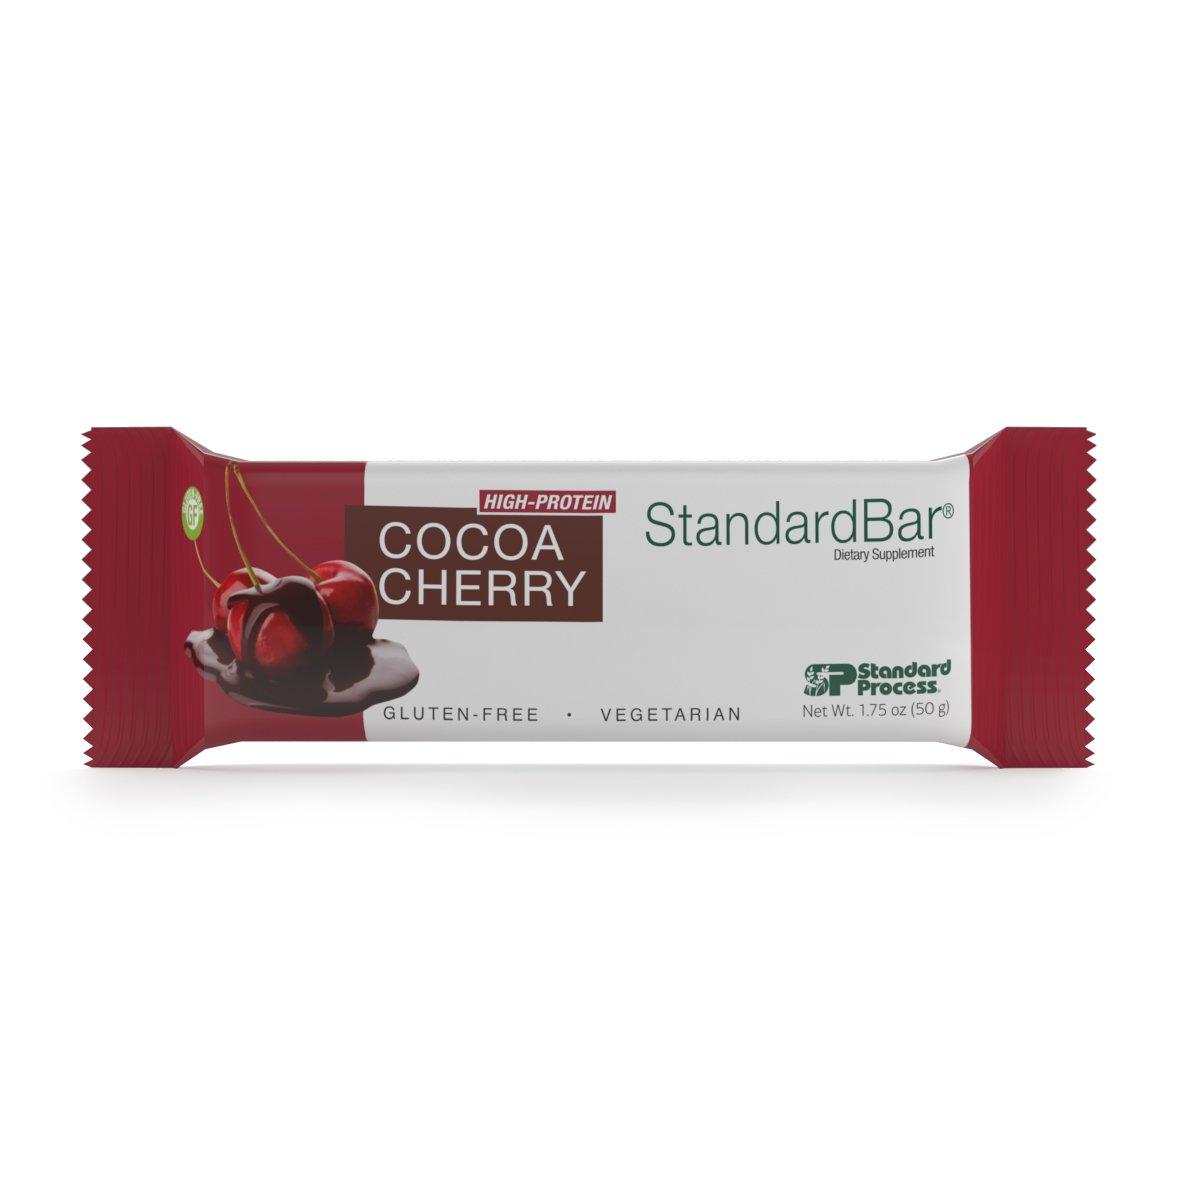 Standard Process - Cocoa Cherry StandardBar - High-Protein Supplement, 15 g Protein, Calcium, Dietary Fiber, Gluten Free and Vegetarian - 18 Bars (1.75 oz. Each)